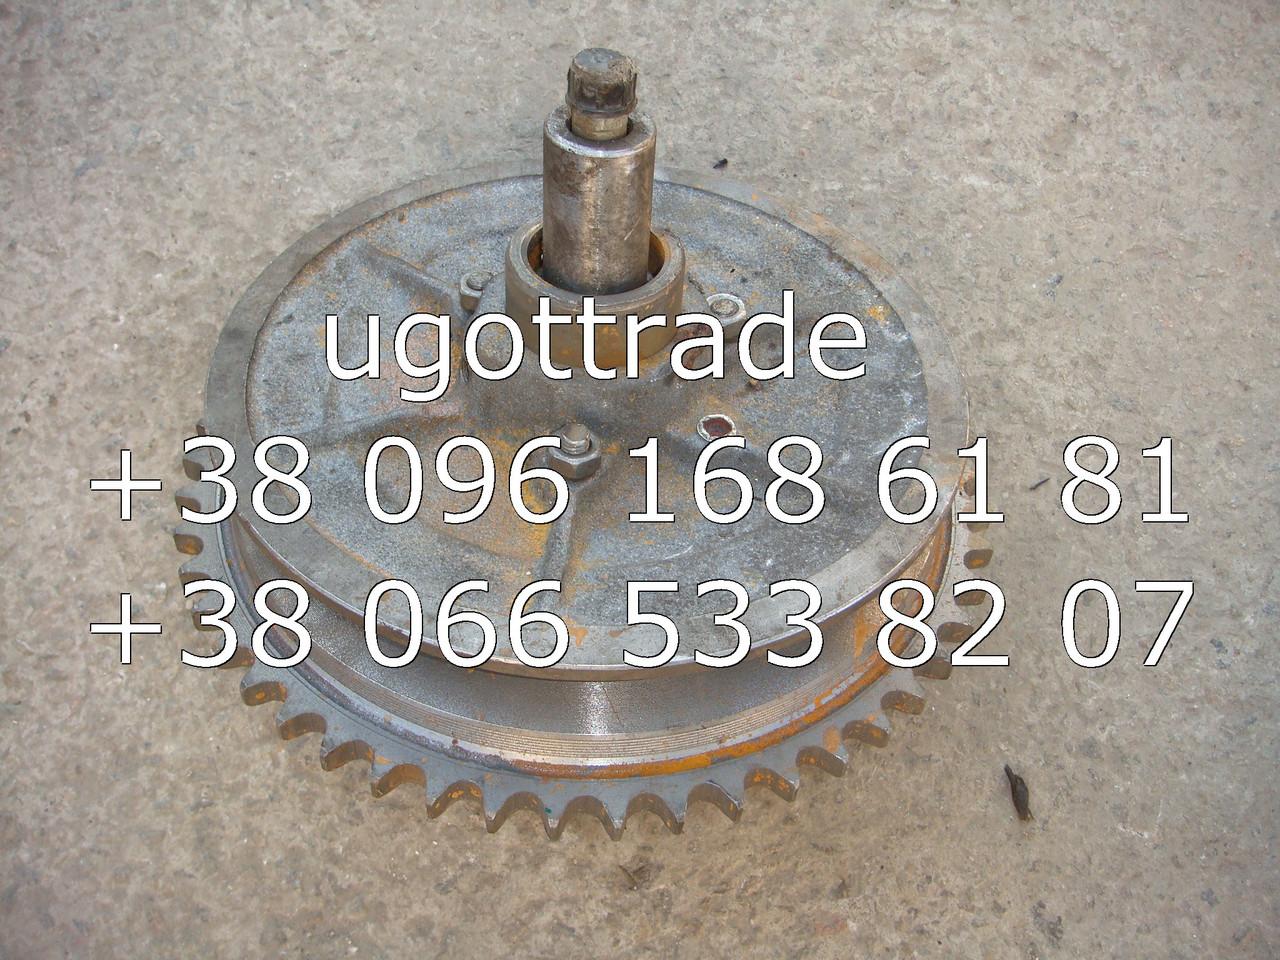 Вариатор жатки нижний, Н065.15.000, СК-5М НИВА, ЖВН